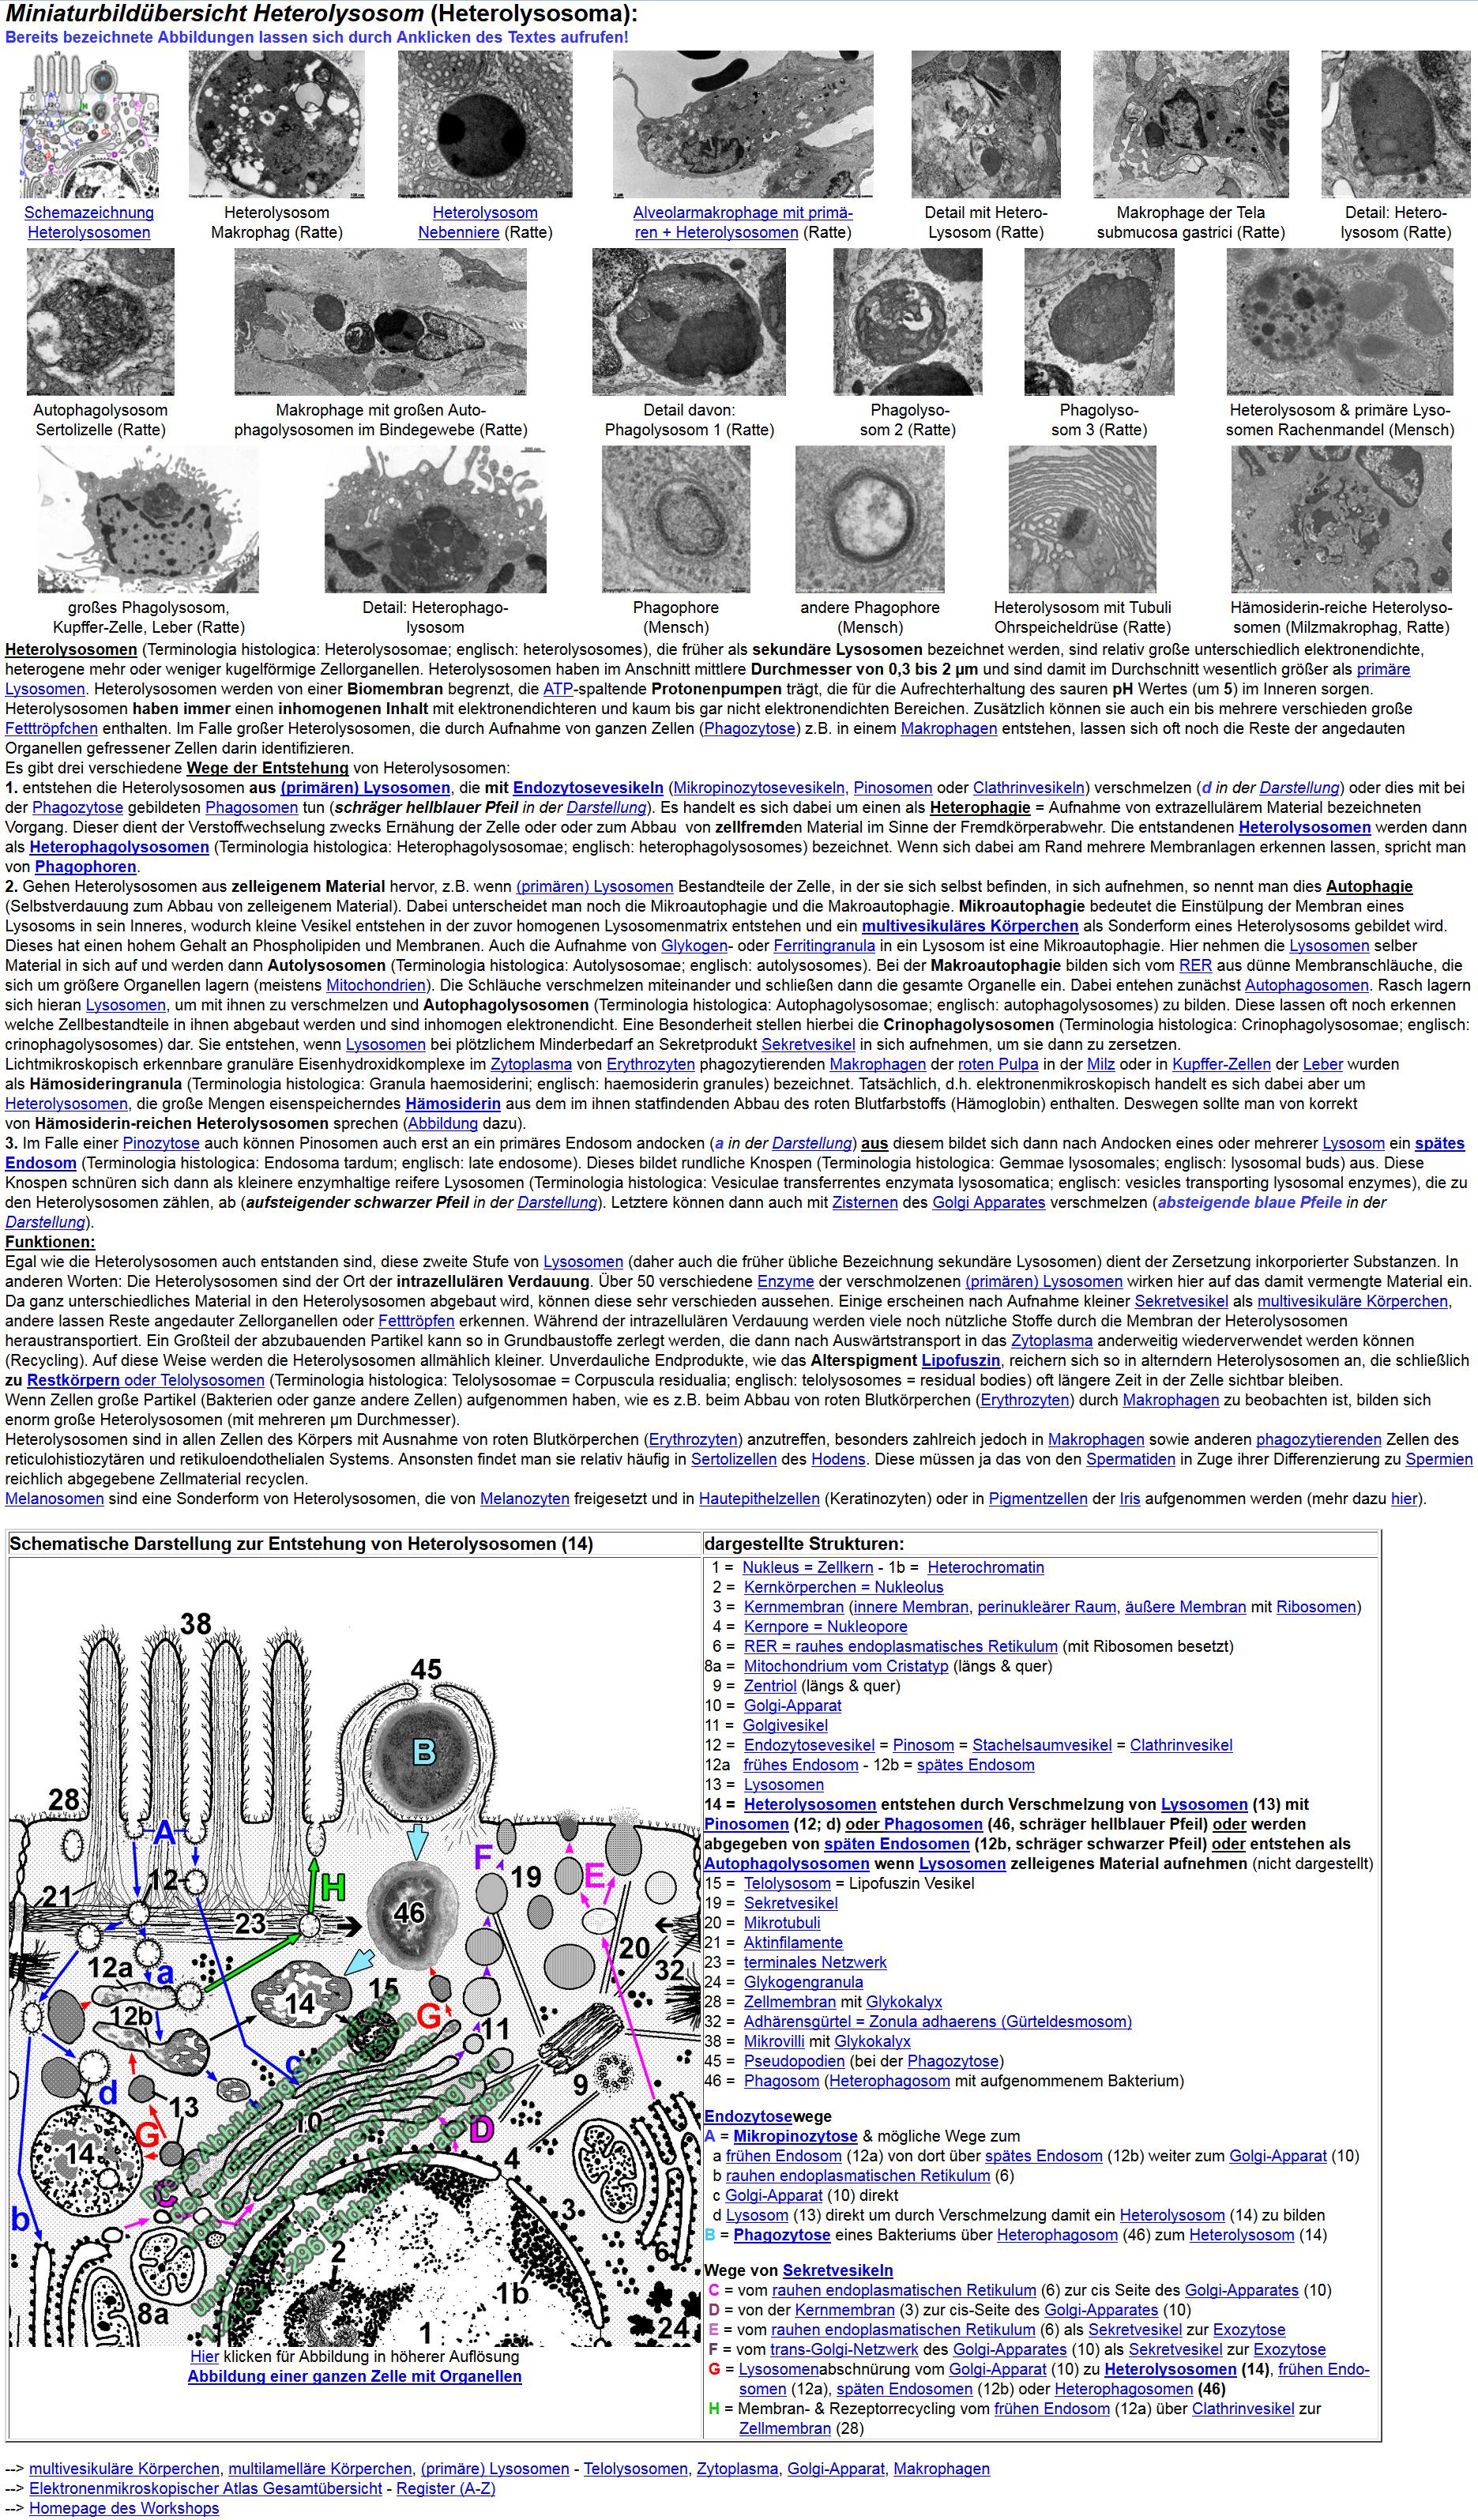 Elektronenmikroskopischer Atlas professionelle Version